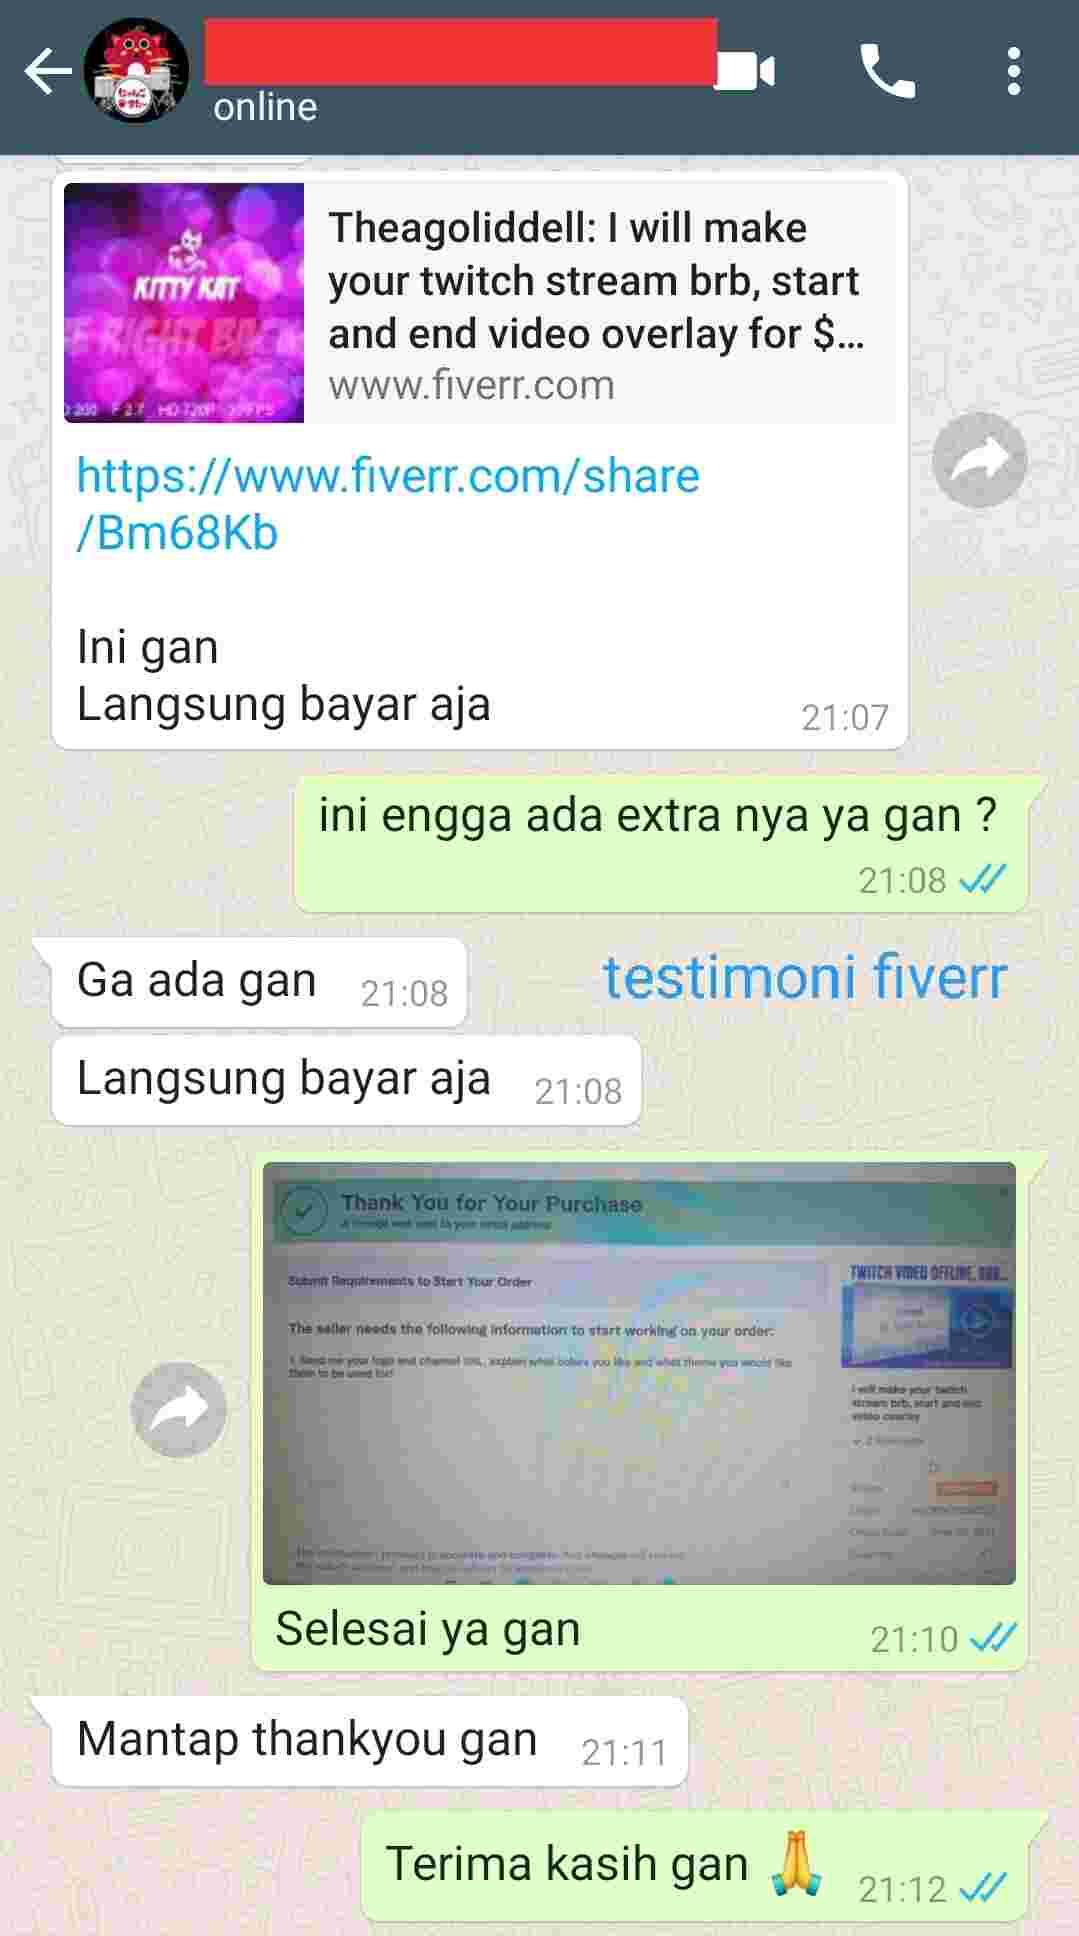 testimonial fiverr